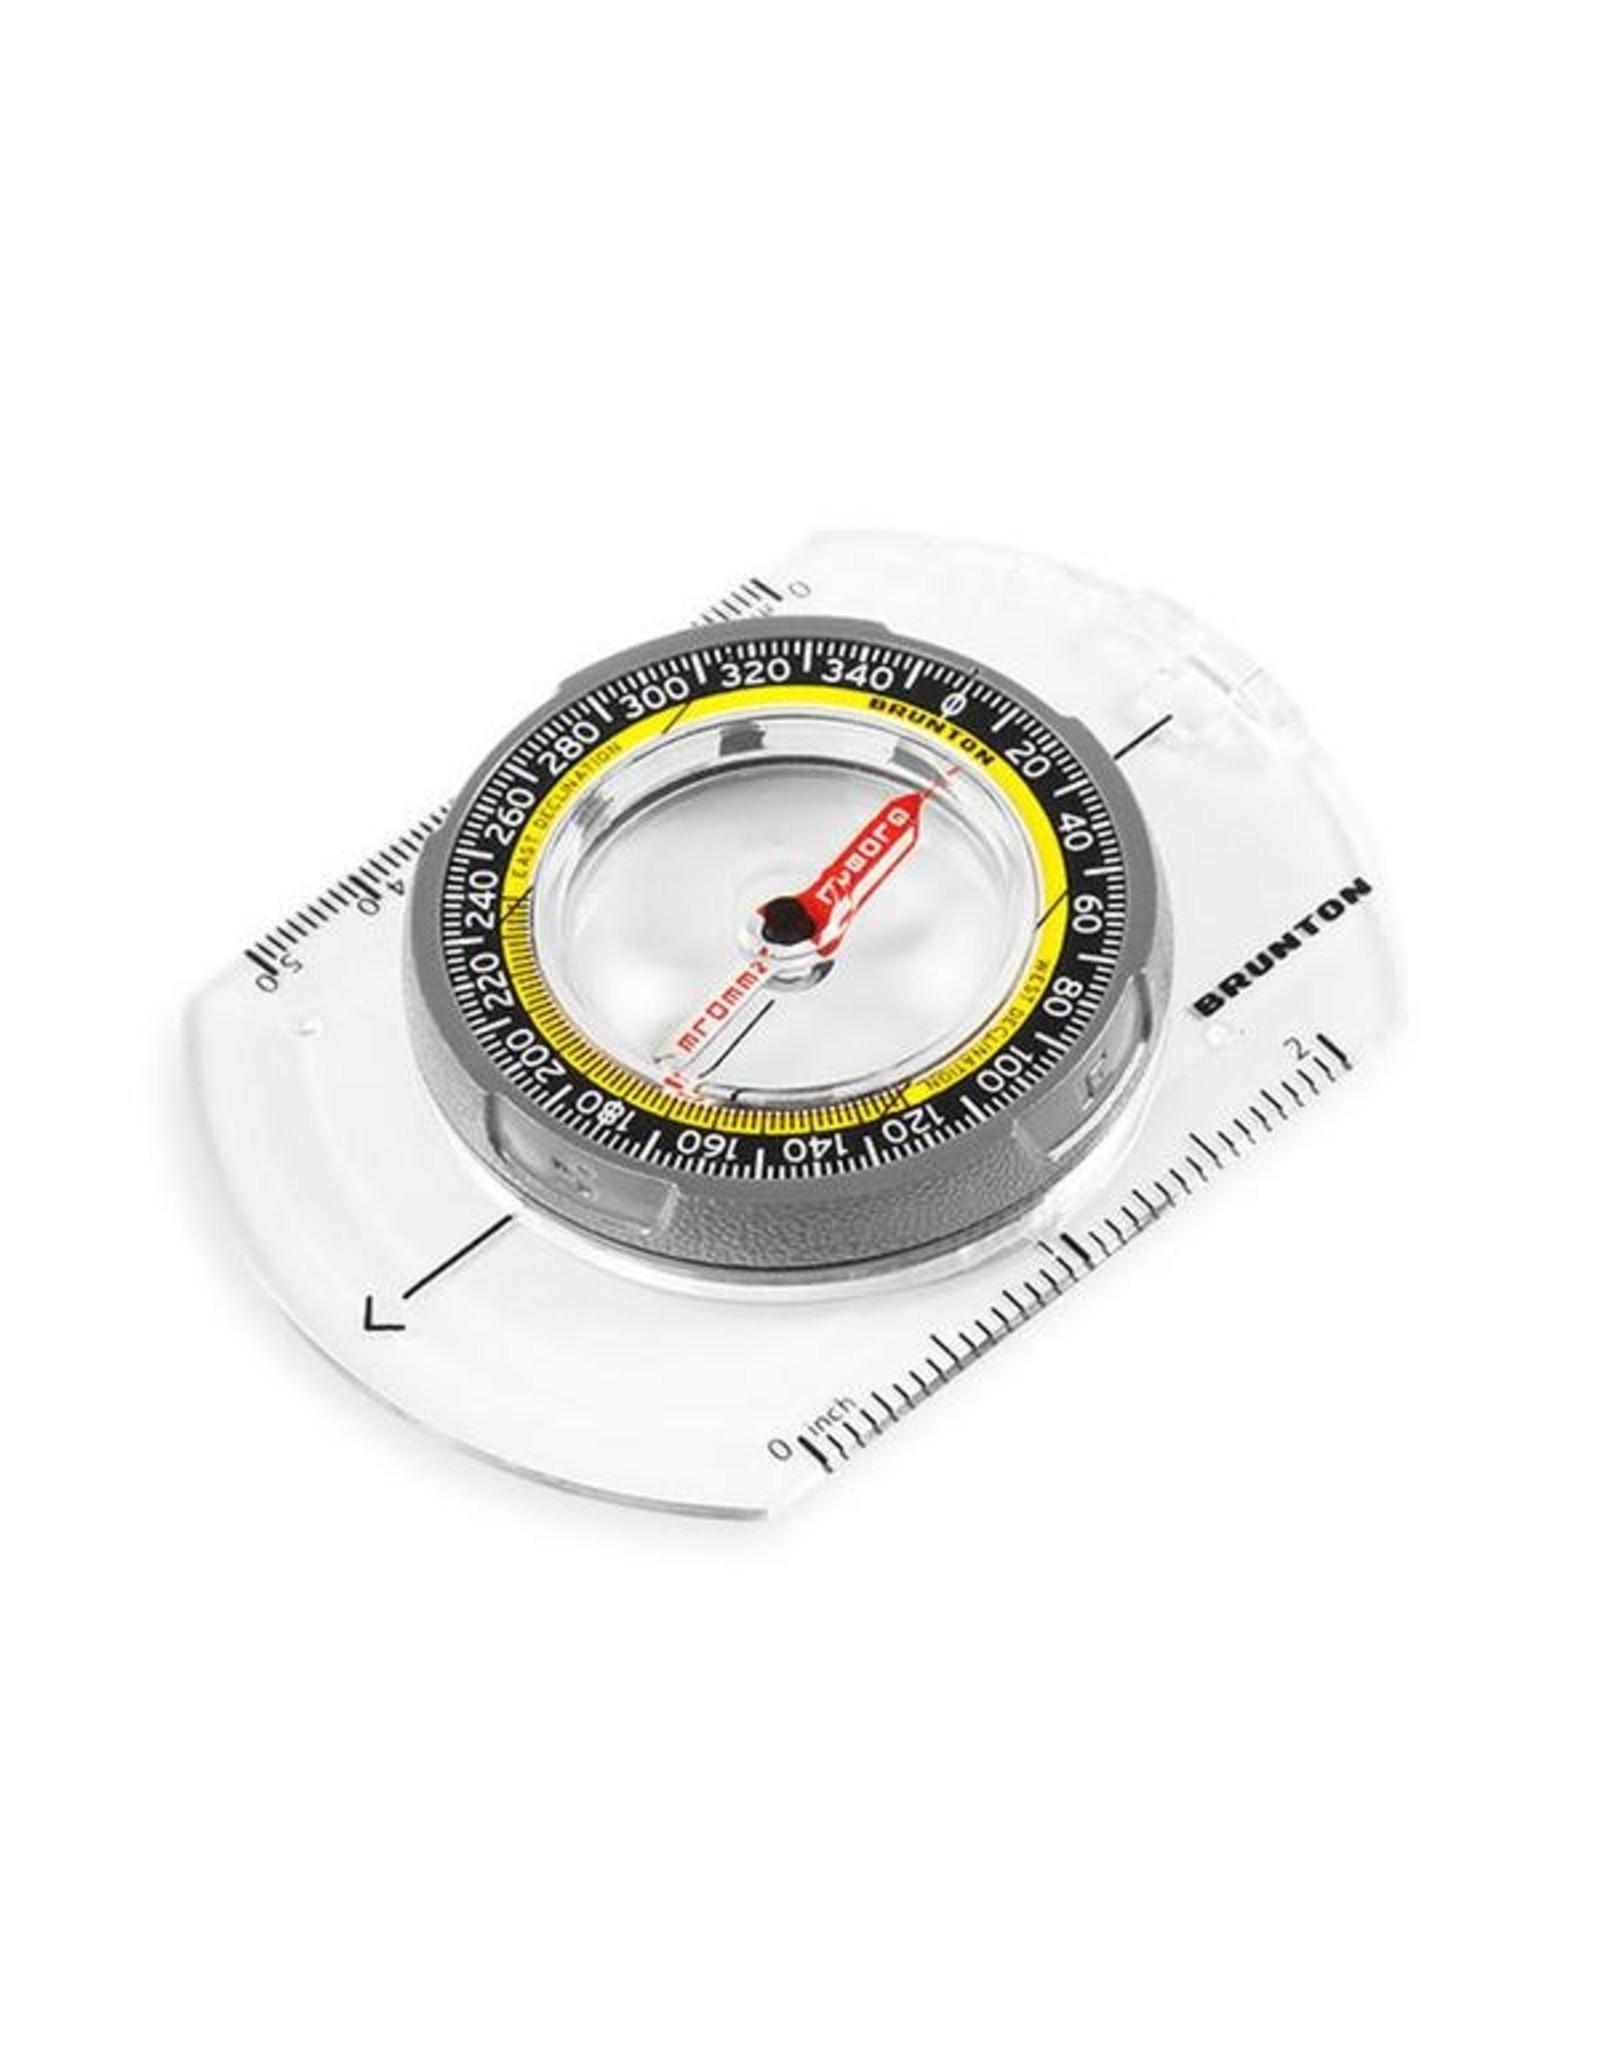 BRUNTON brunton truarc 3 baseplate compass